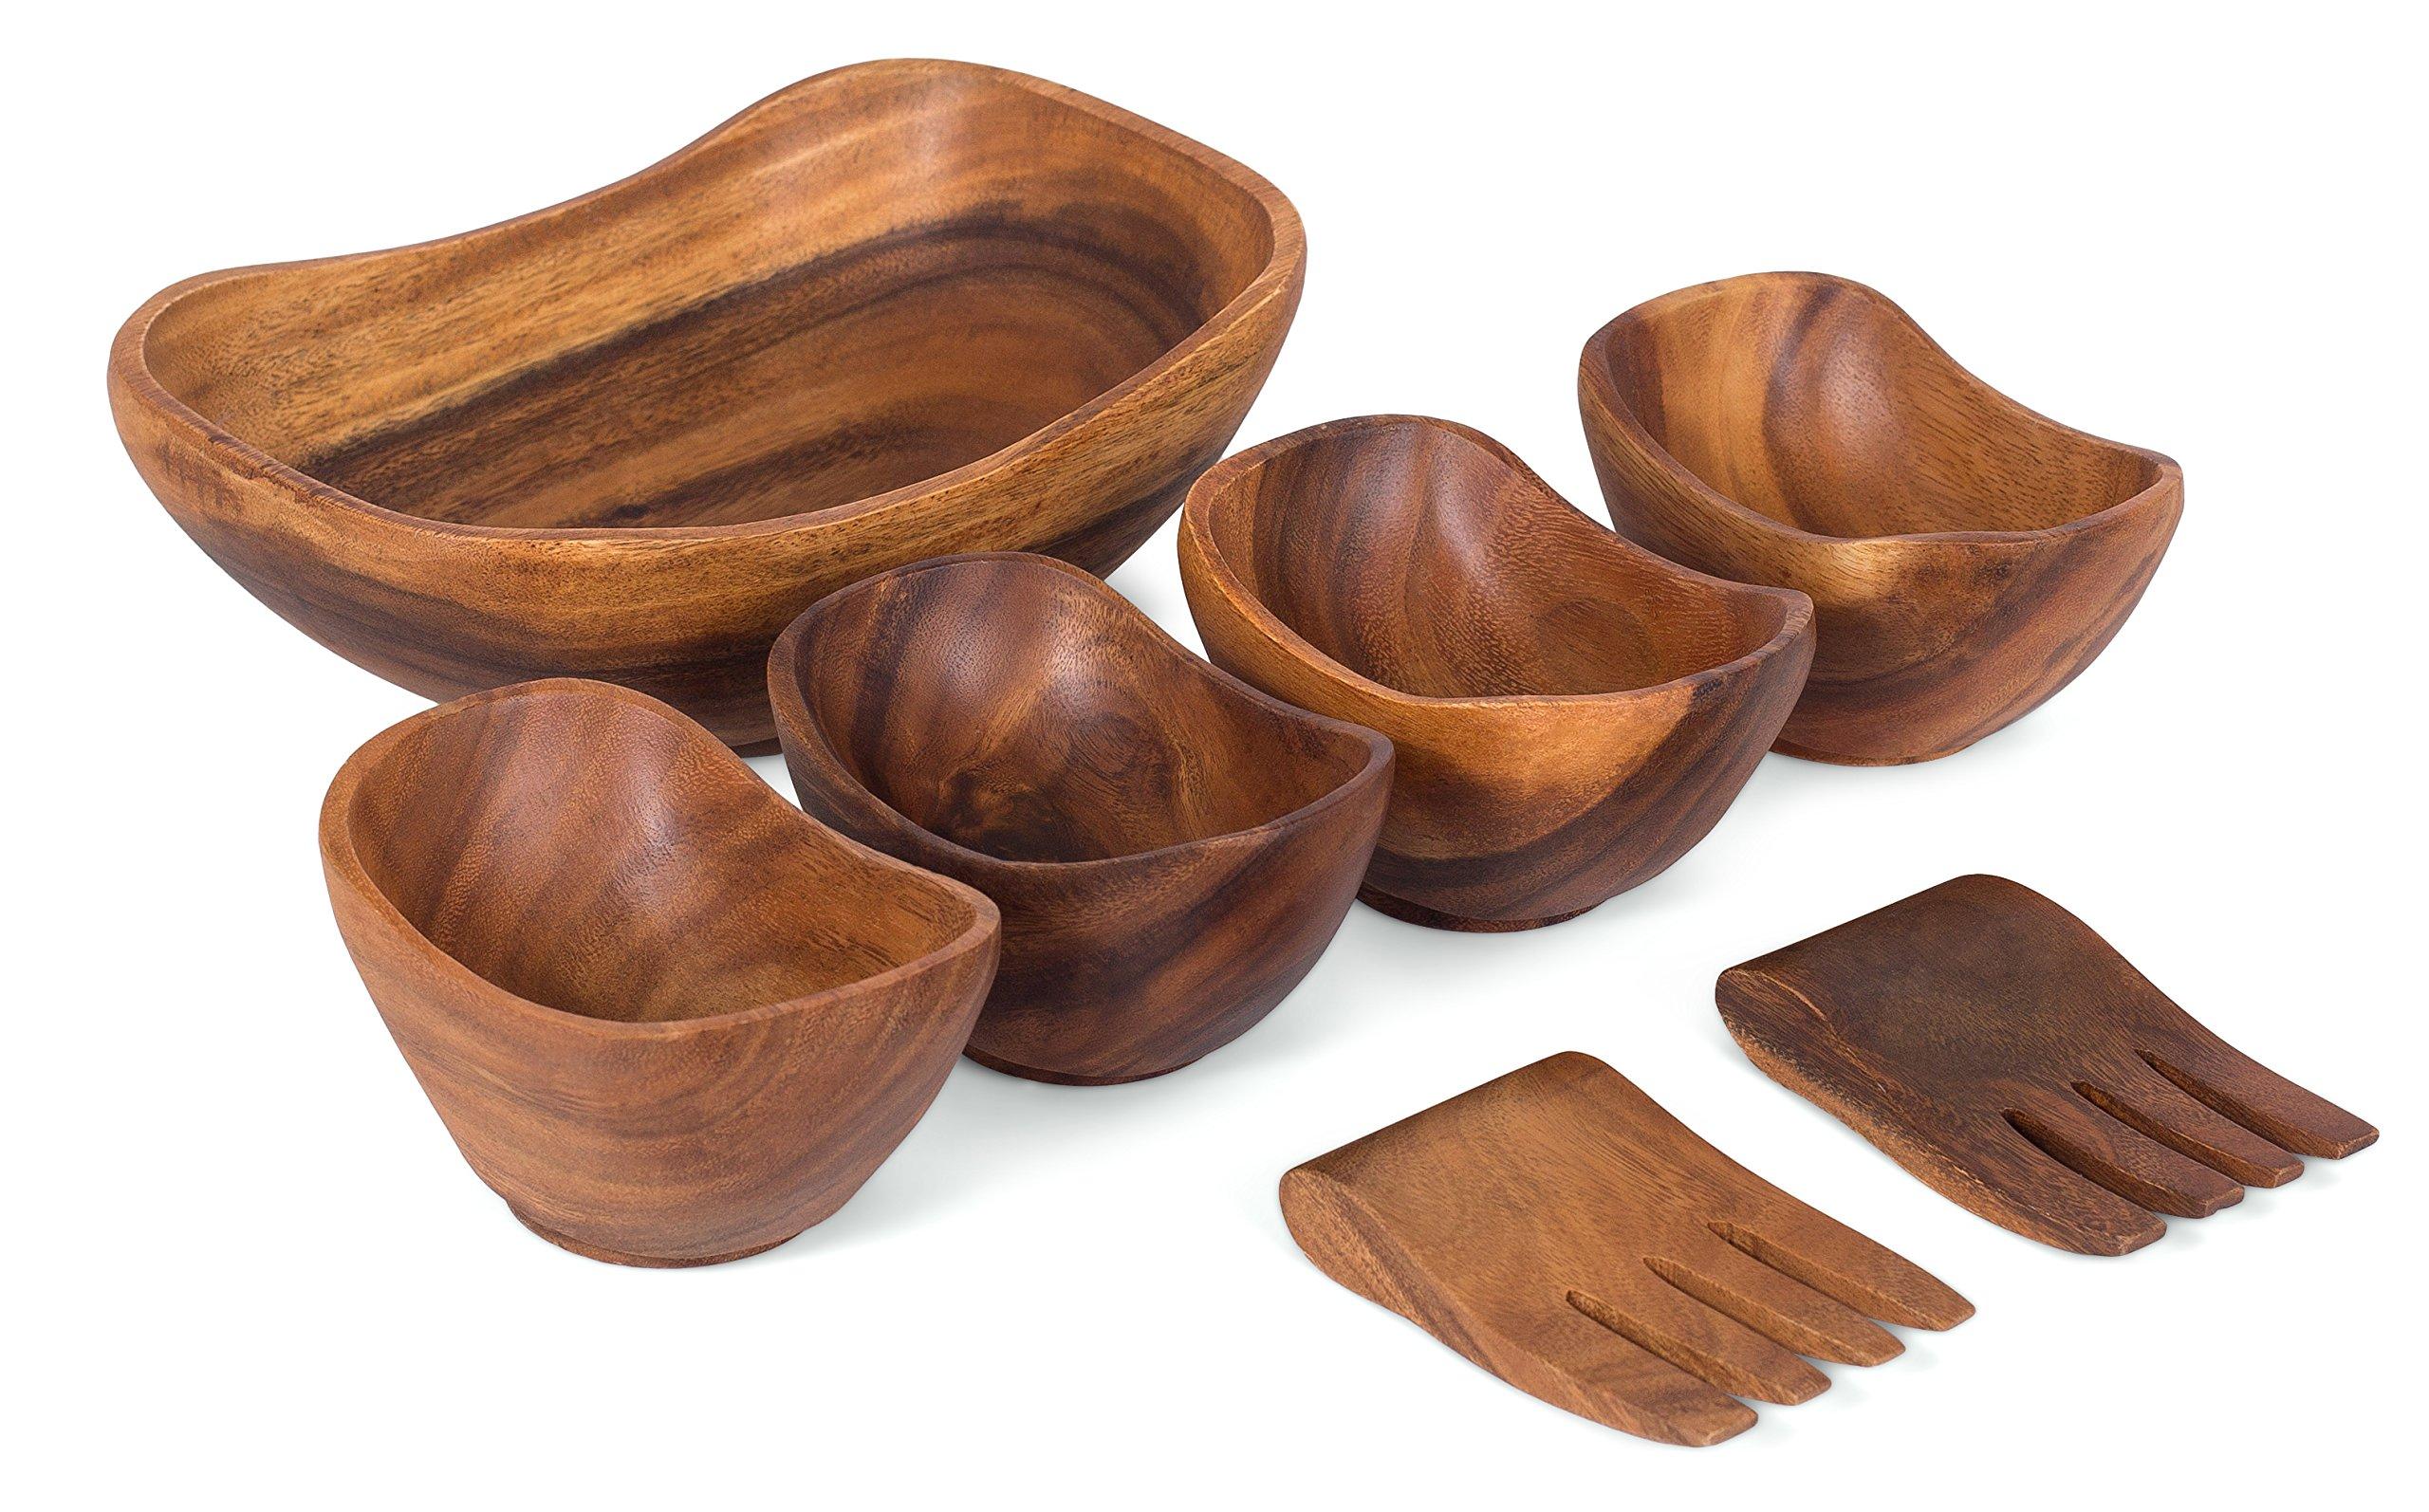 BirdRock Home Oval Boatshape Salad Bowl | Acacia Wood Server Set of 7 | Salad Hands | Small